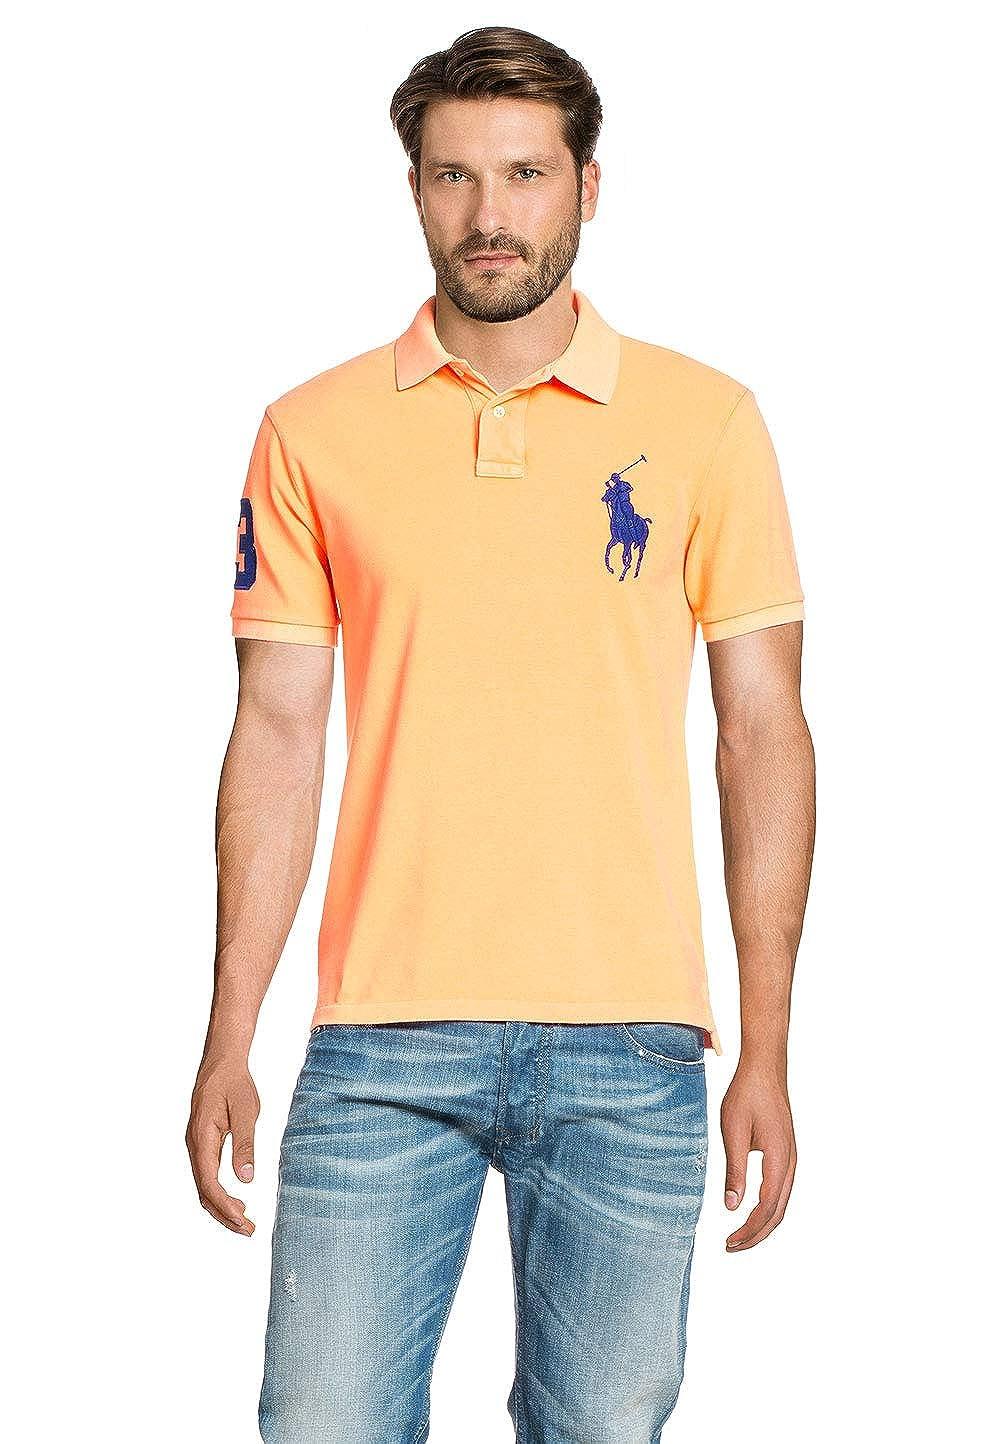 Polo Ralph Lauren Knits Mesh MenŽs Polo Shirt Melon, tamaño:S ...